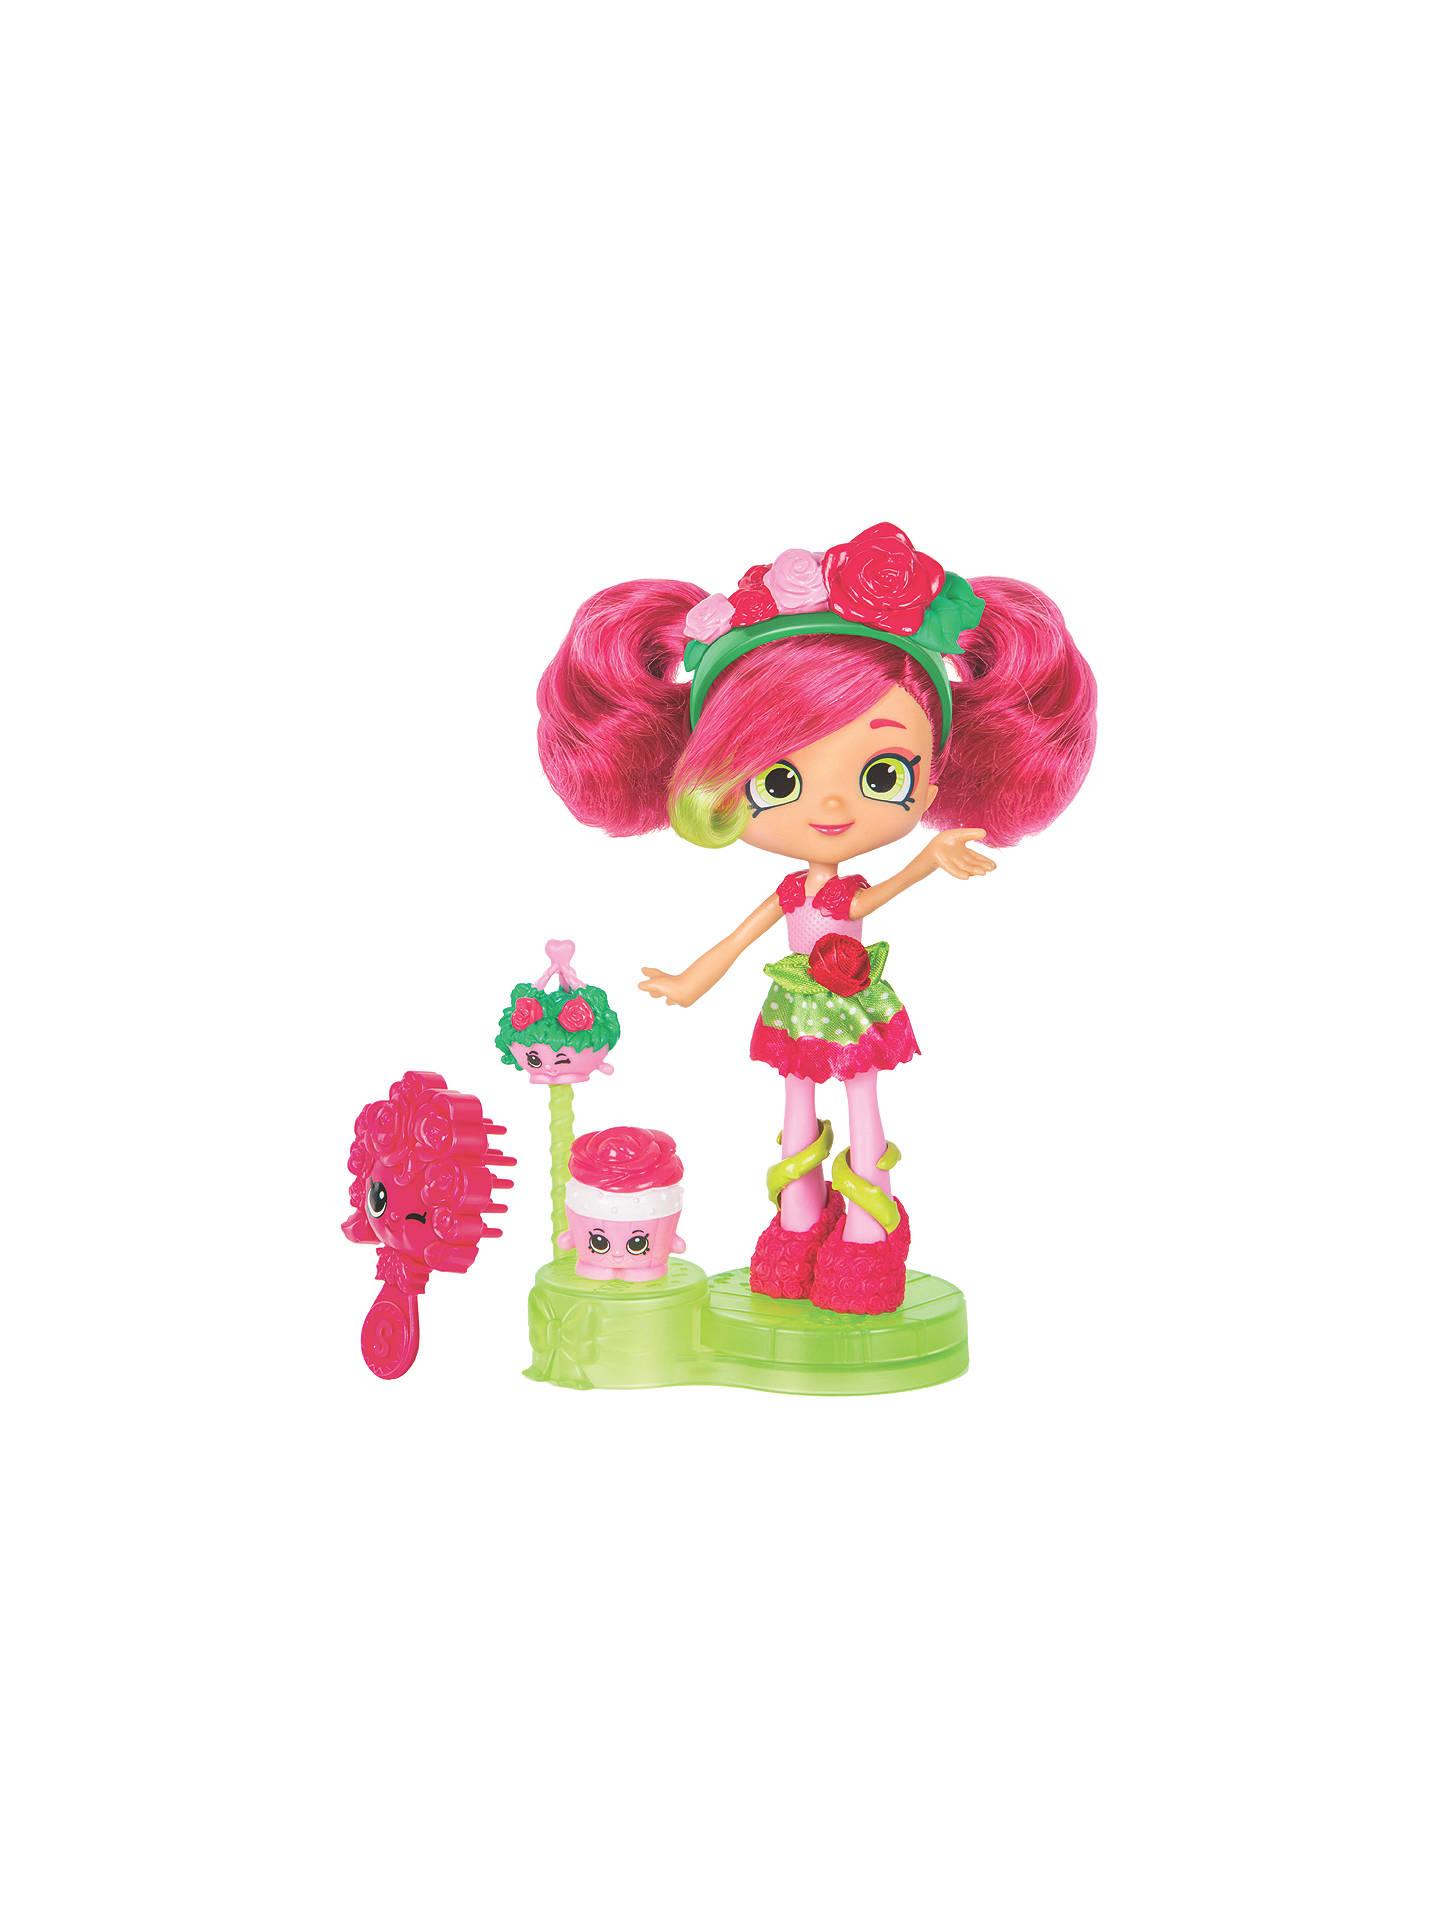 Shopkins shoppies rosie bloom doll at john lewis partners - John lewis shopkins ...